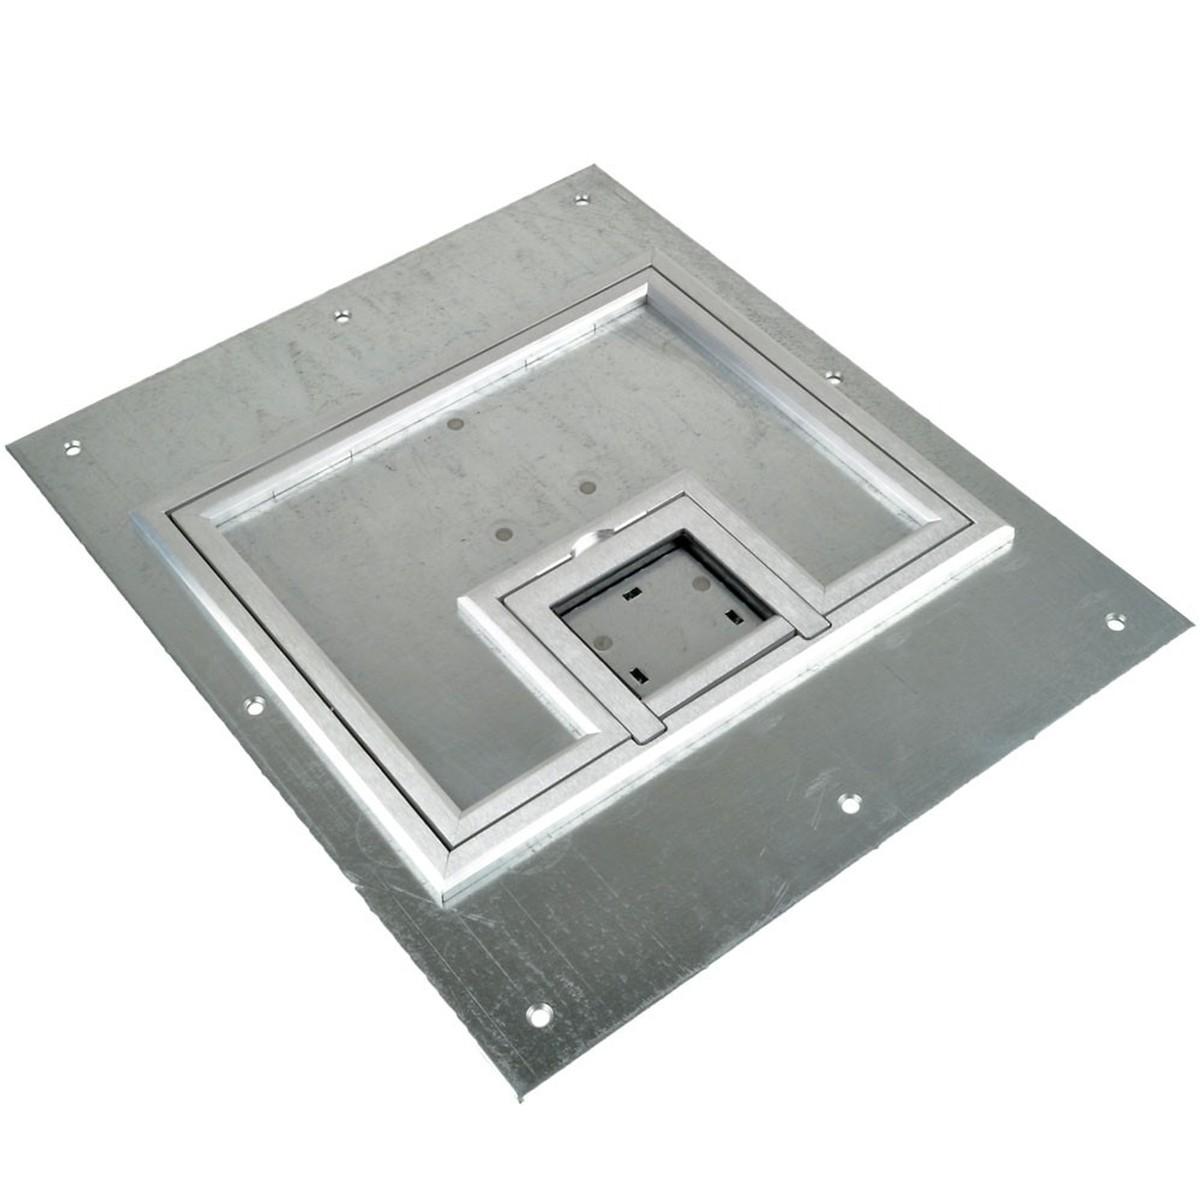 Fsr Fl 500p Slp C Ul Cover W 1 4 Quot Aluminum Flange Lift